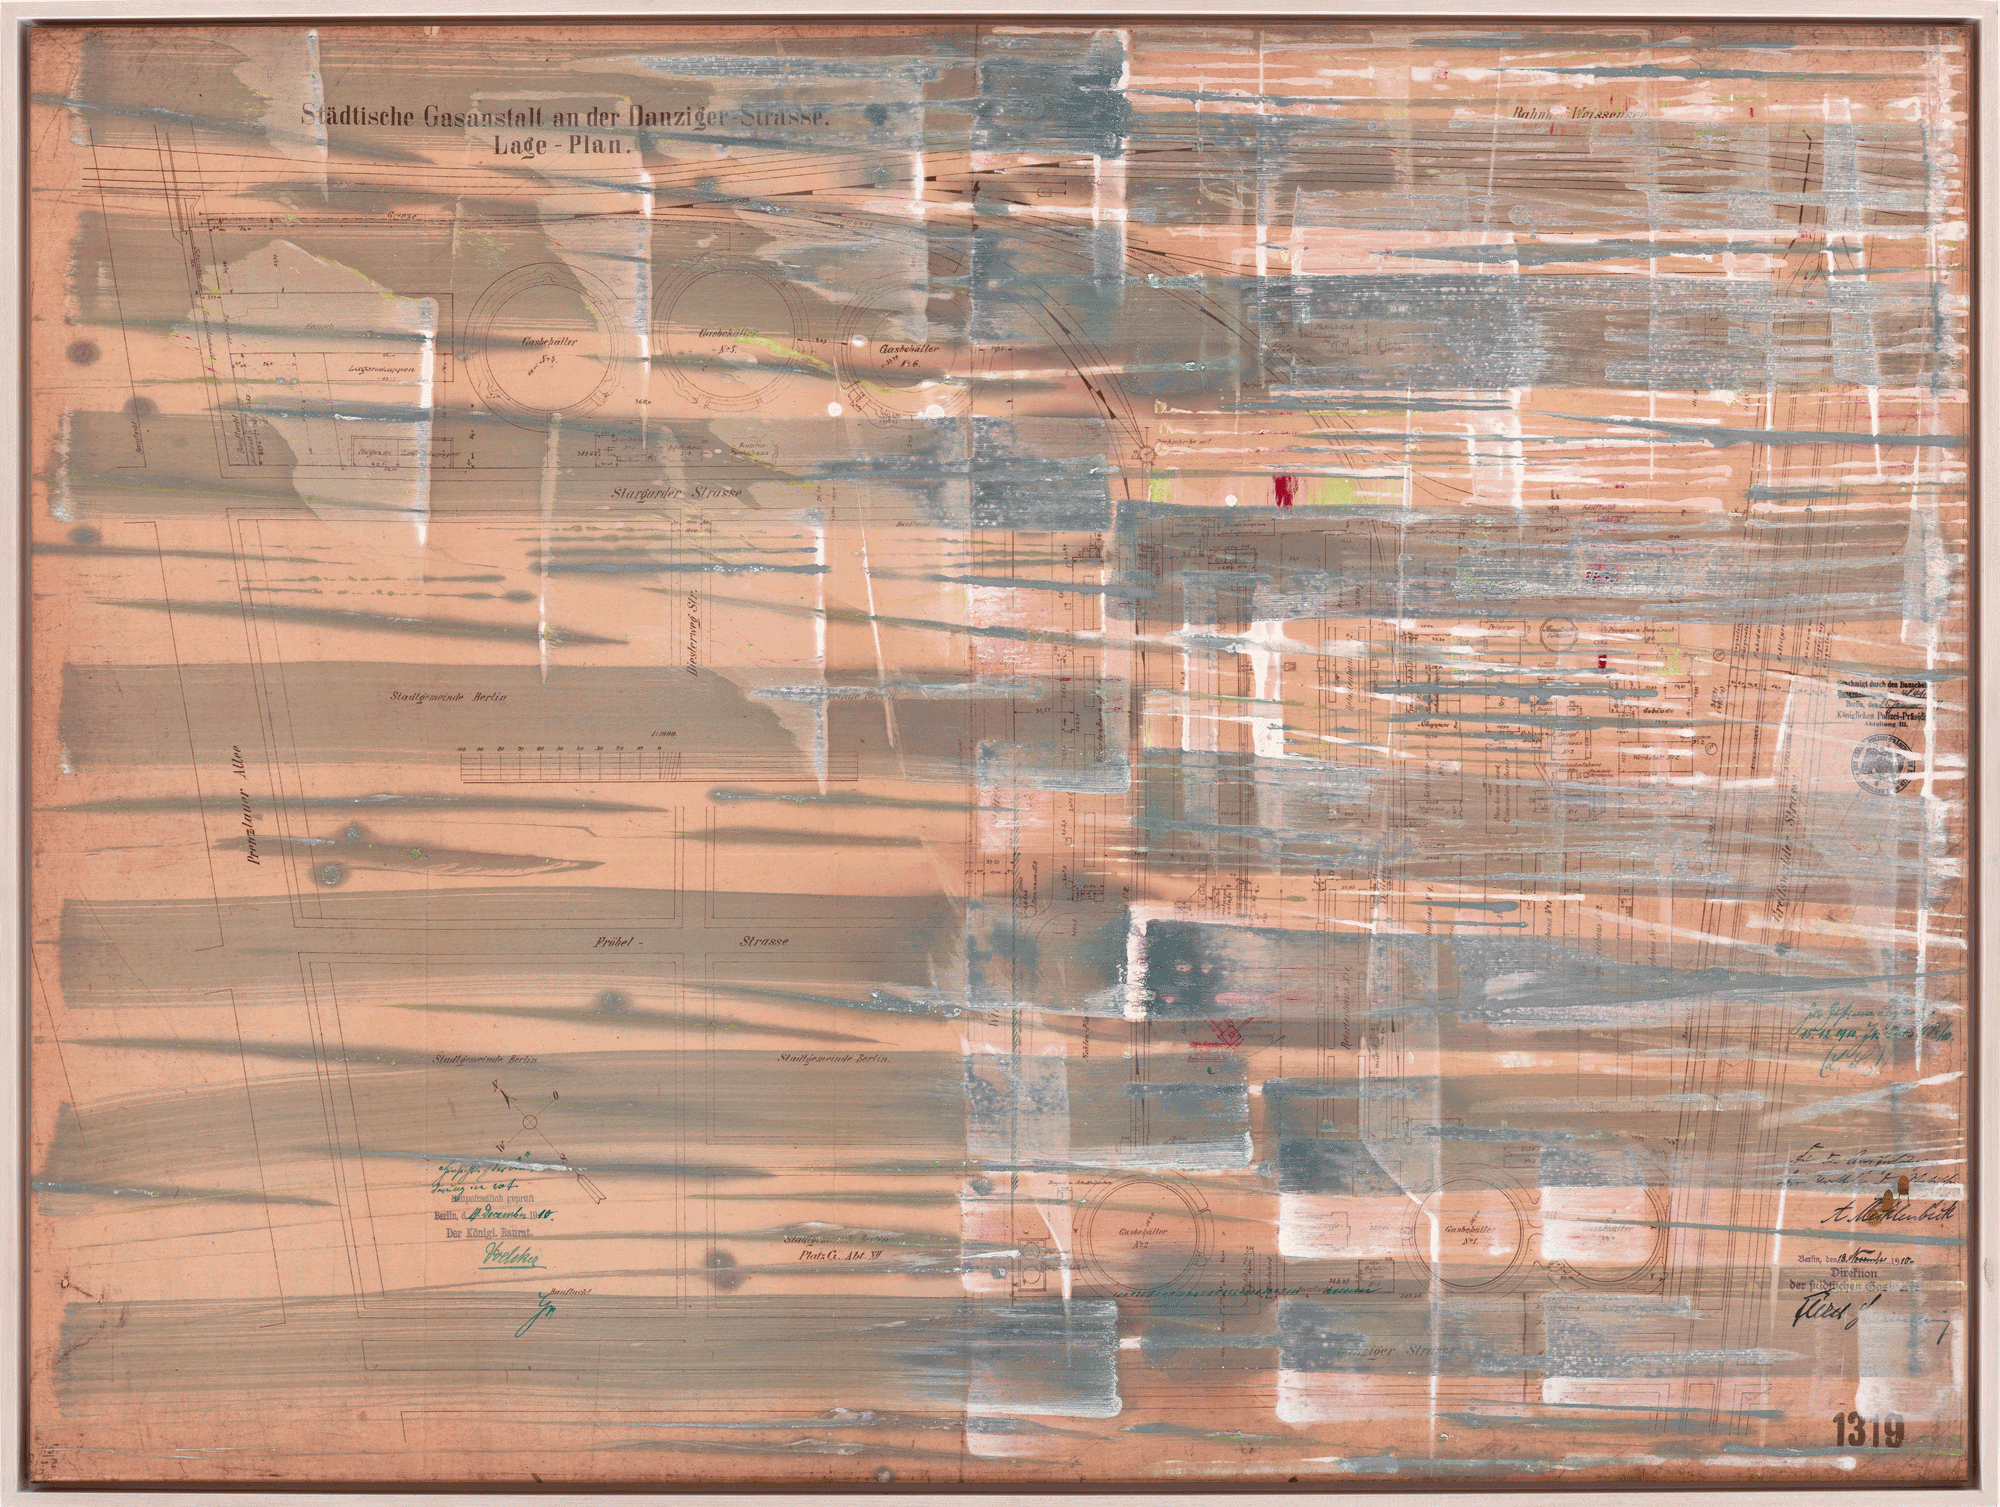 Yvonne Andreini, Time Layers, 2020, 90 x 120 cm, Tusche und Acryl auf Leinwand